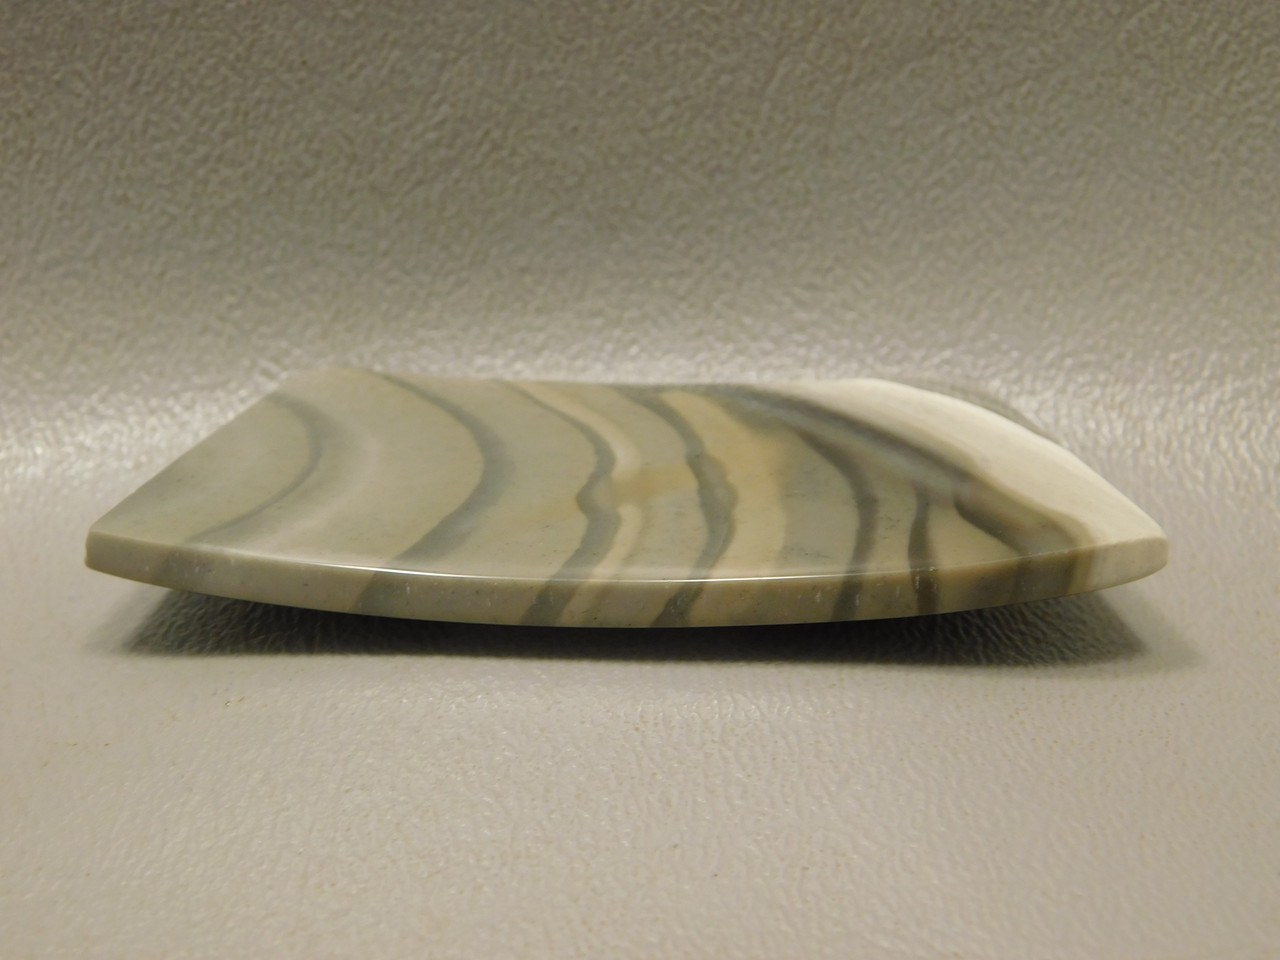 Polish Flint Designer Cabochon Curved Bar Freeform Shape #8